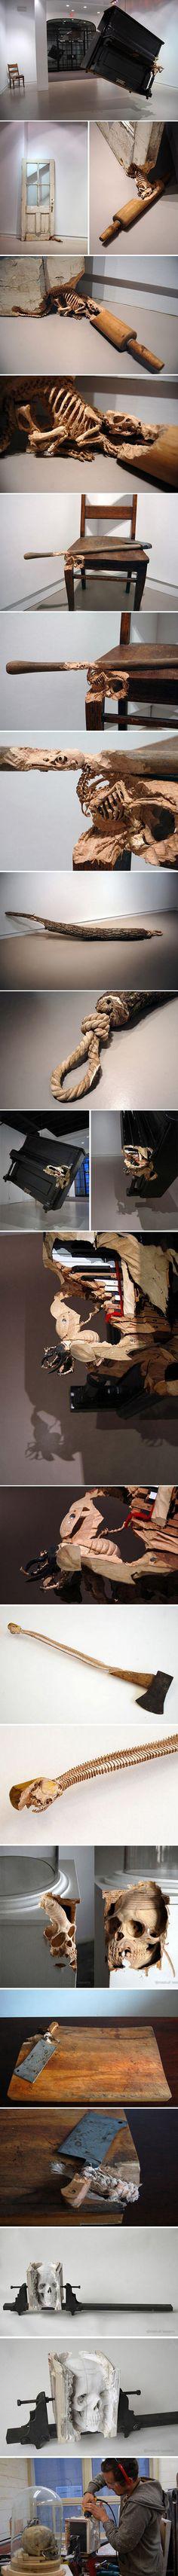 Spectacular Sculptural Wood Carving Work